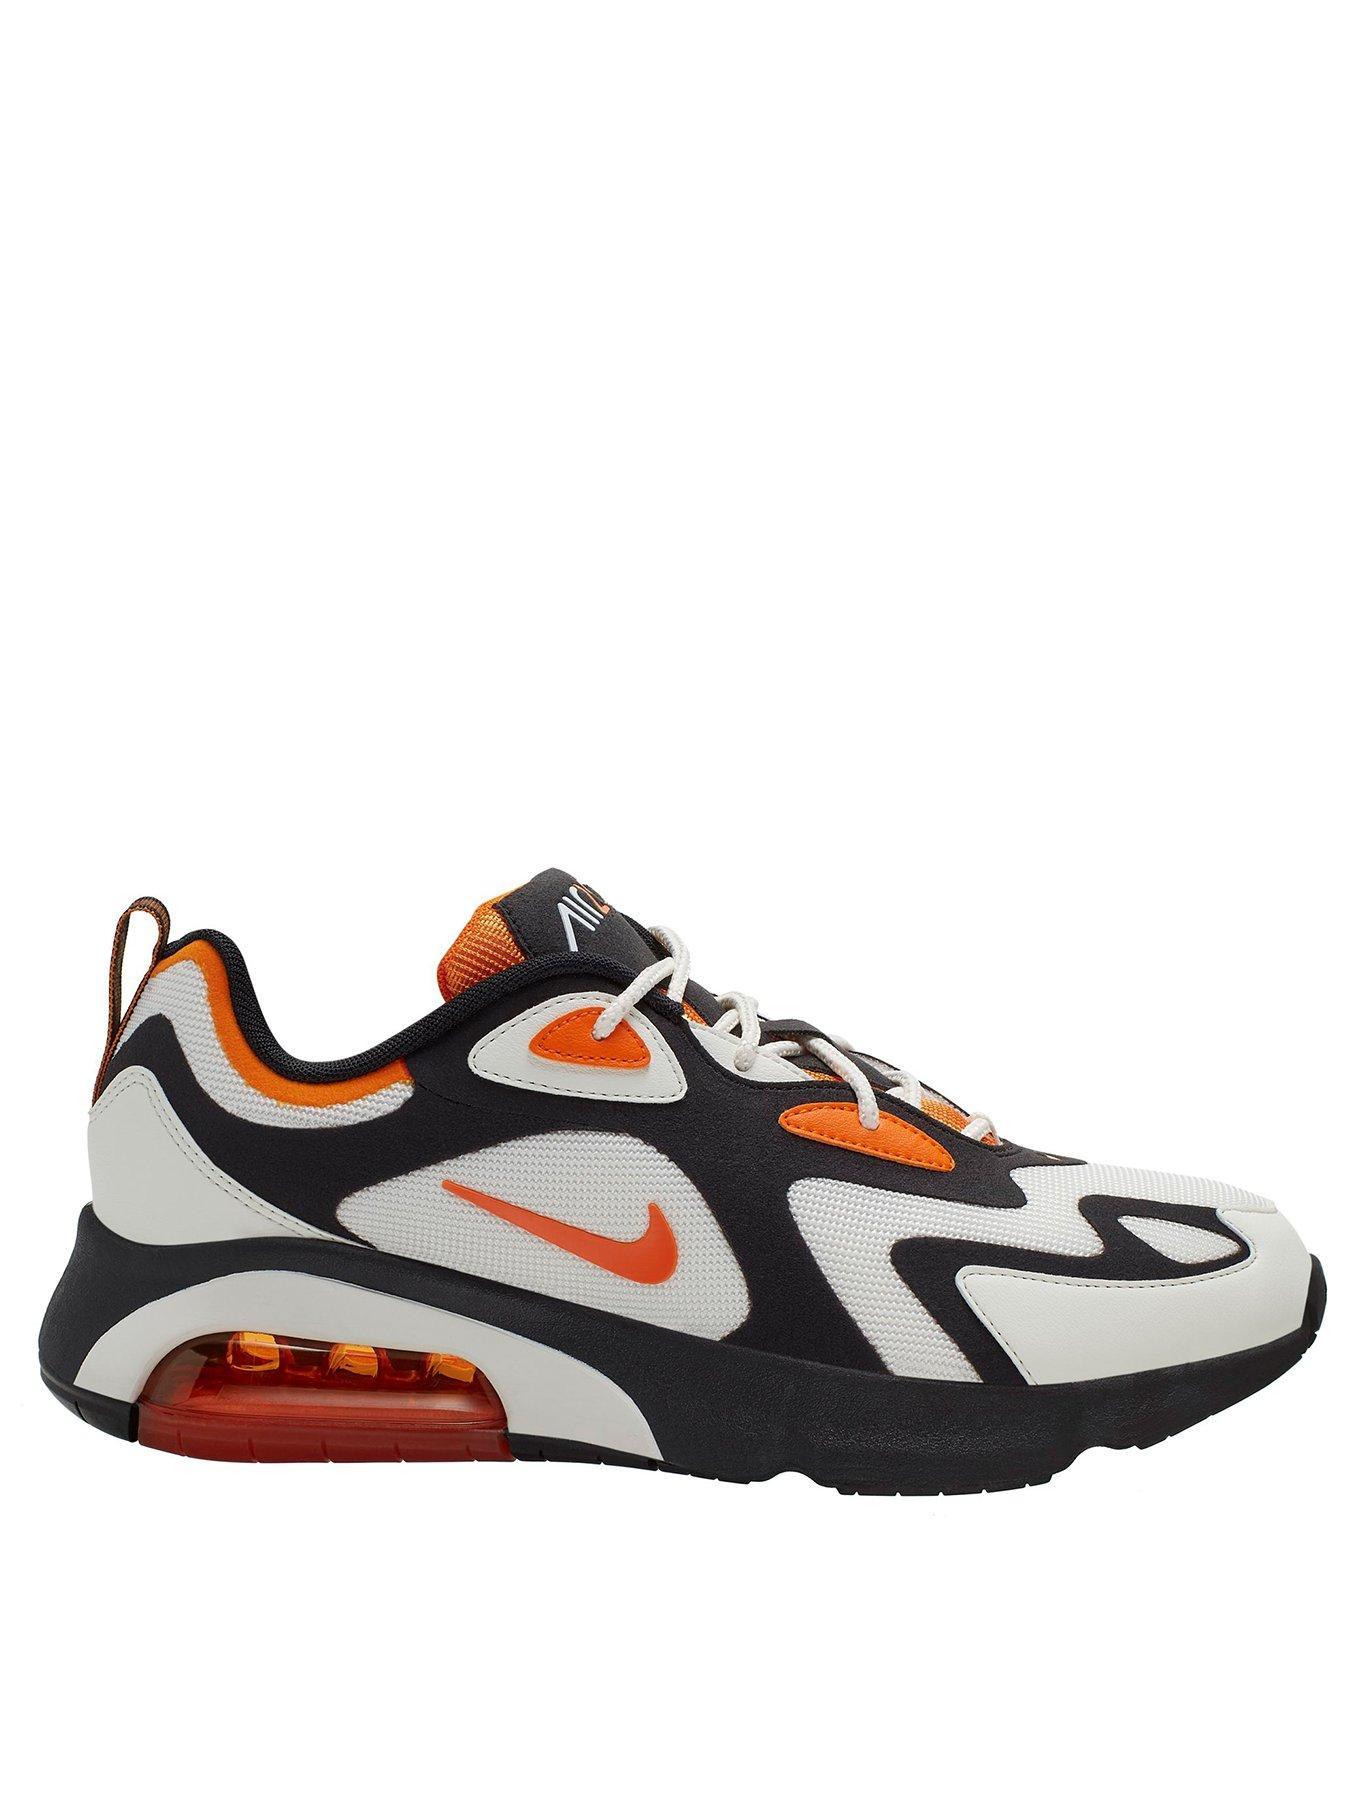 orange and black air max